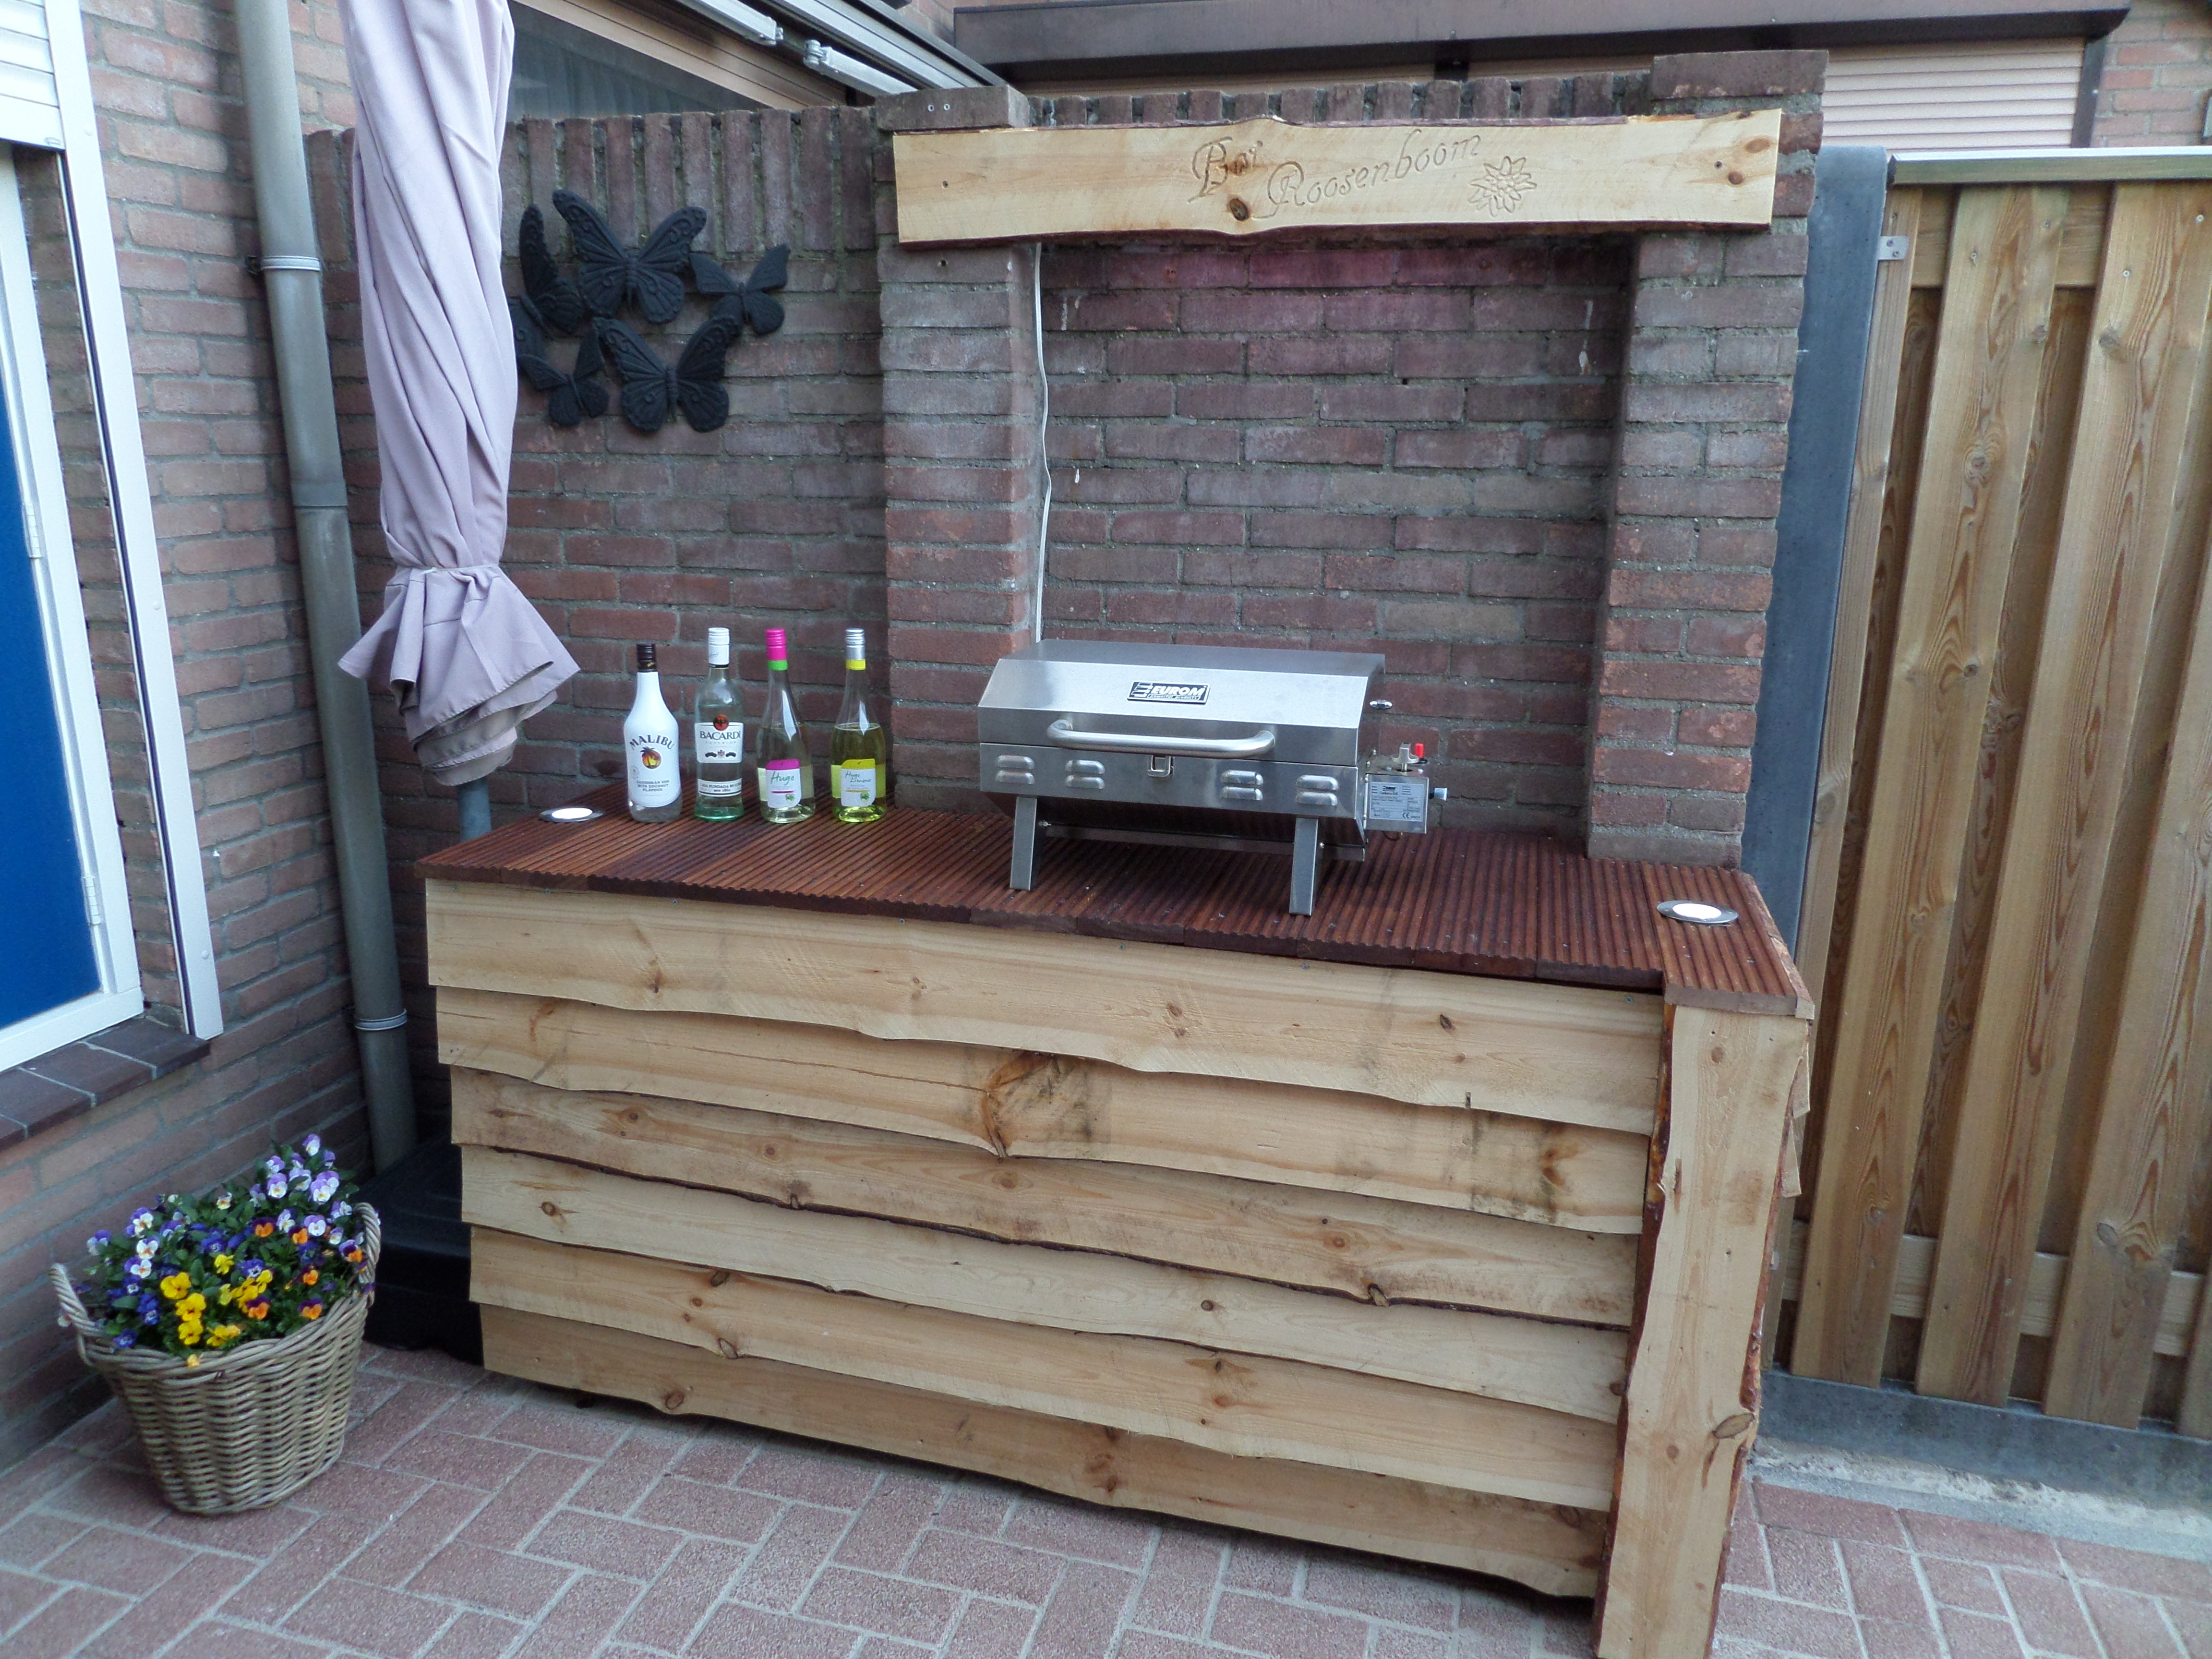 Steigerhout Bar Keuken : Tuin bar maken bar maken in huis u geïmpregneerd hout beitsen